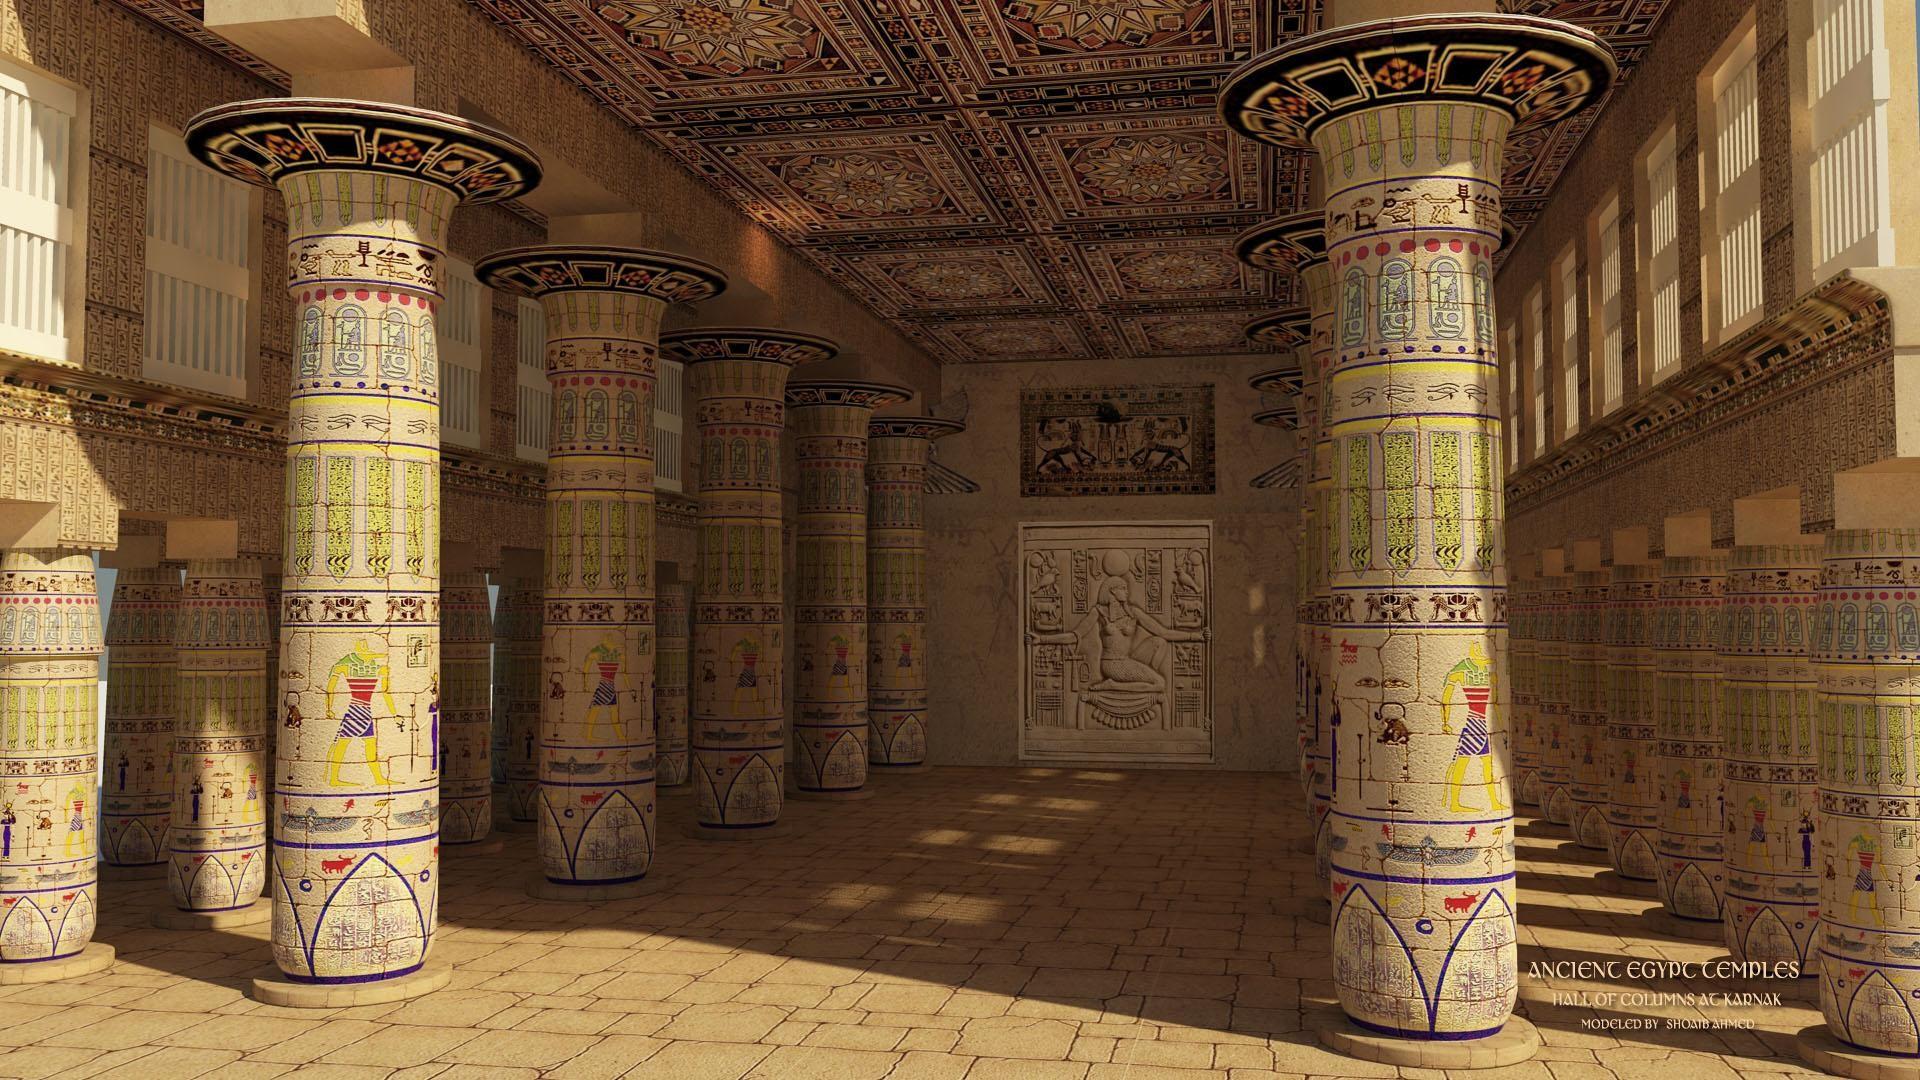 Ancient-Temple-Inside-Ancient-egypt-temple-wallpaper-wp2002228